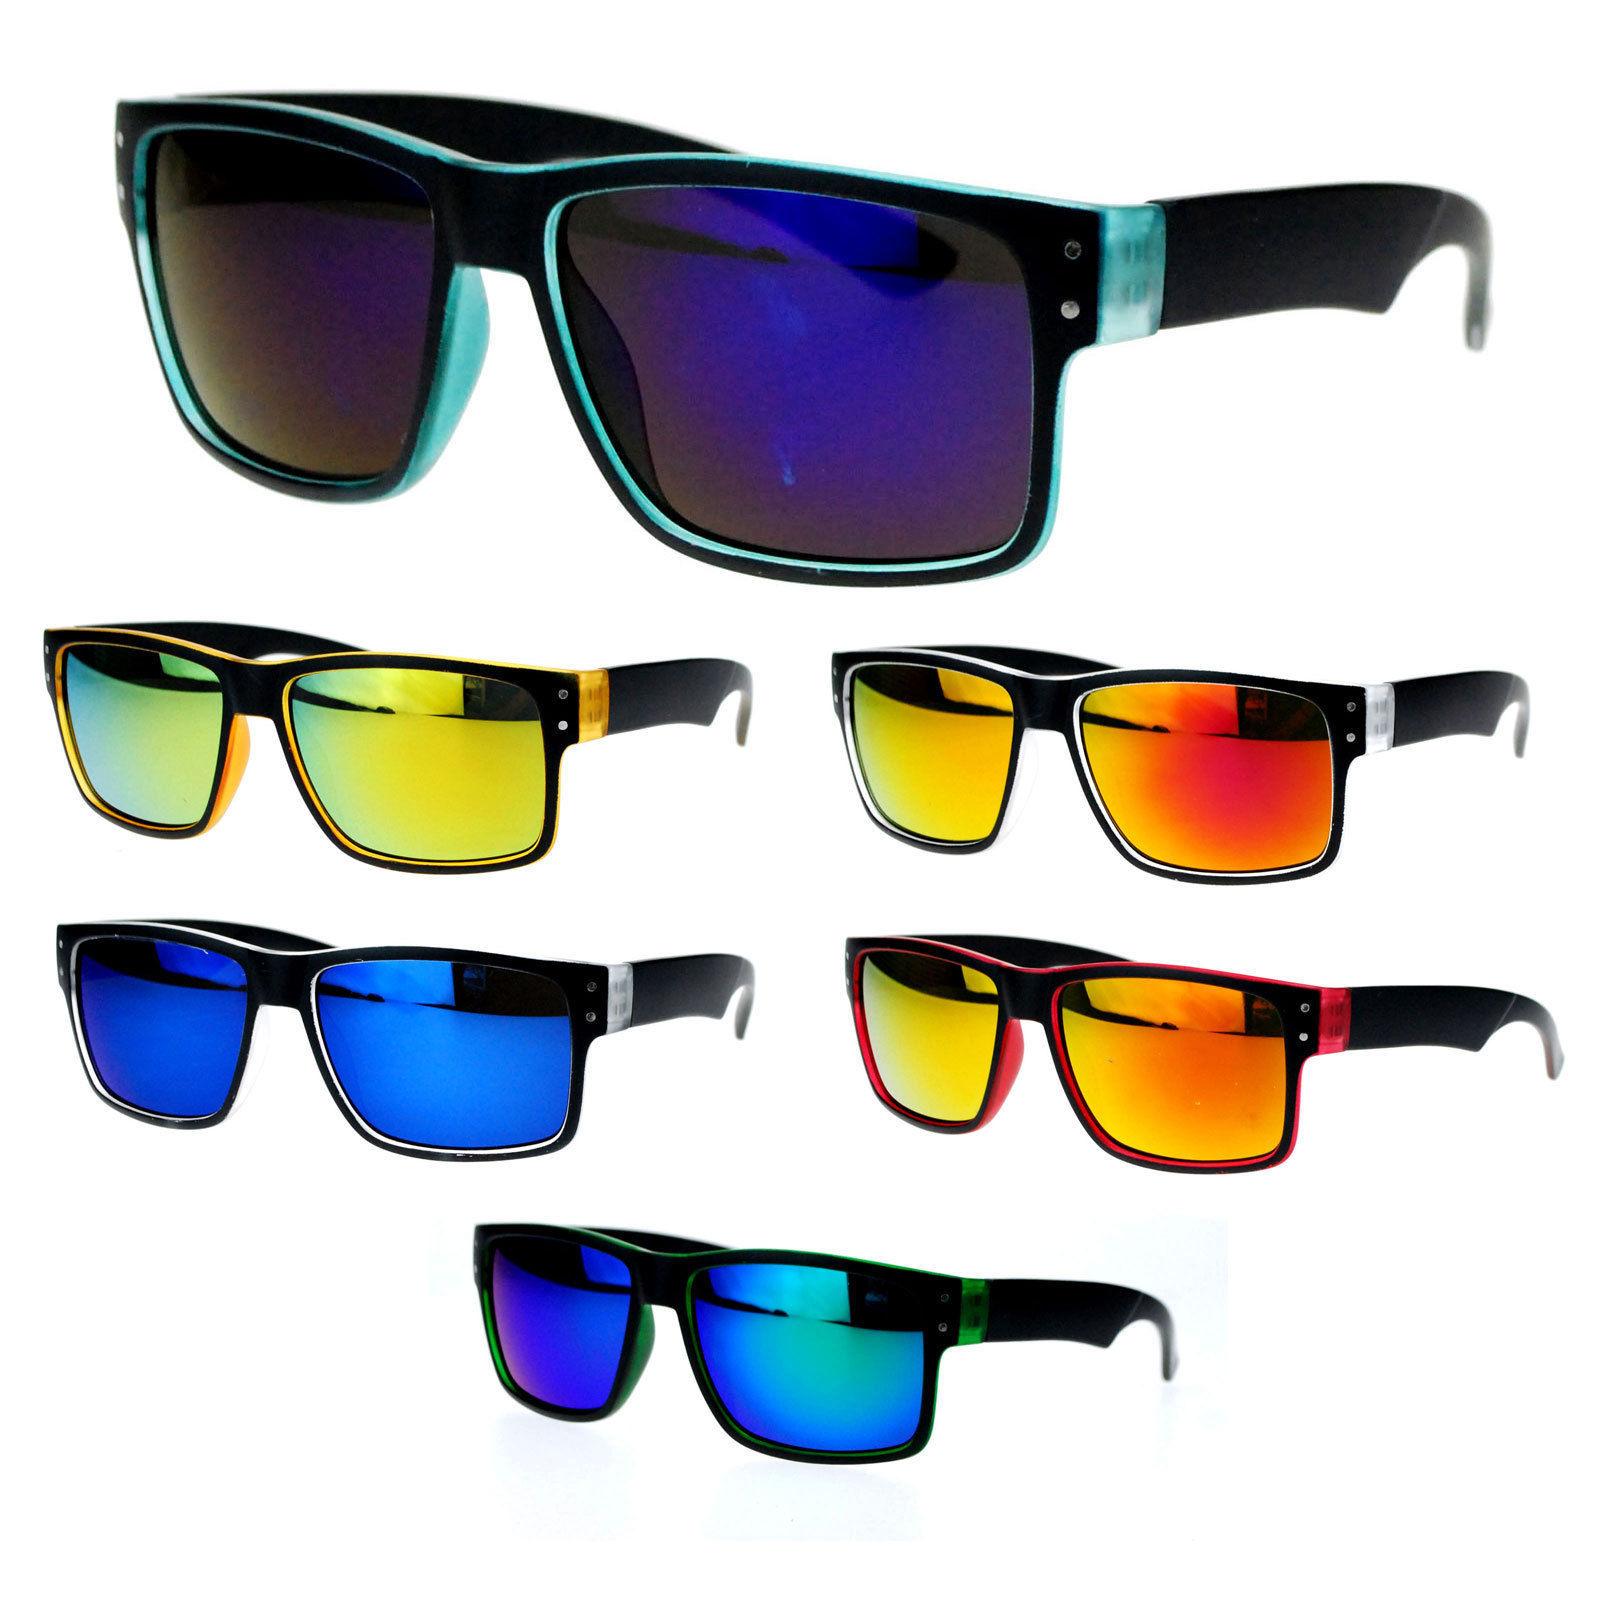 SA106 Lion Emblem Thick Plastic Mens Luxury Biker Sport Sunglasses